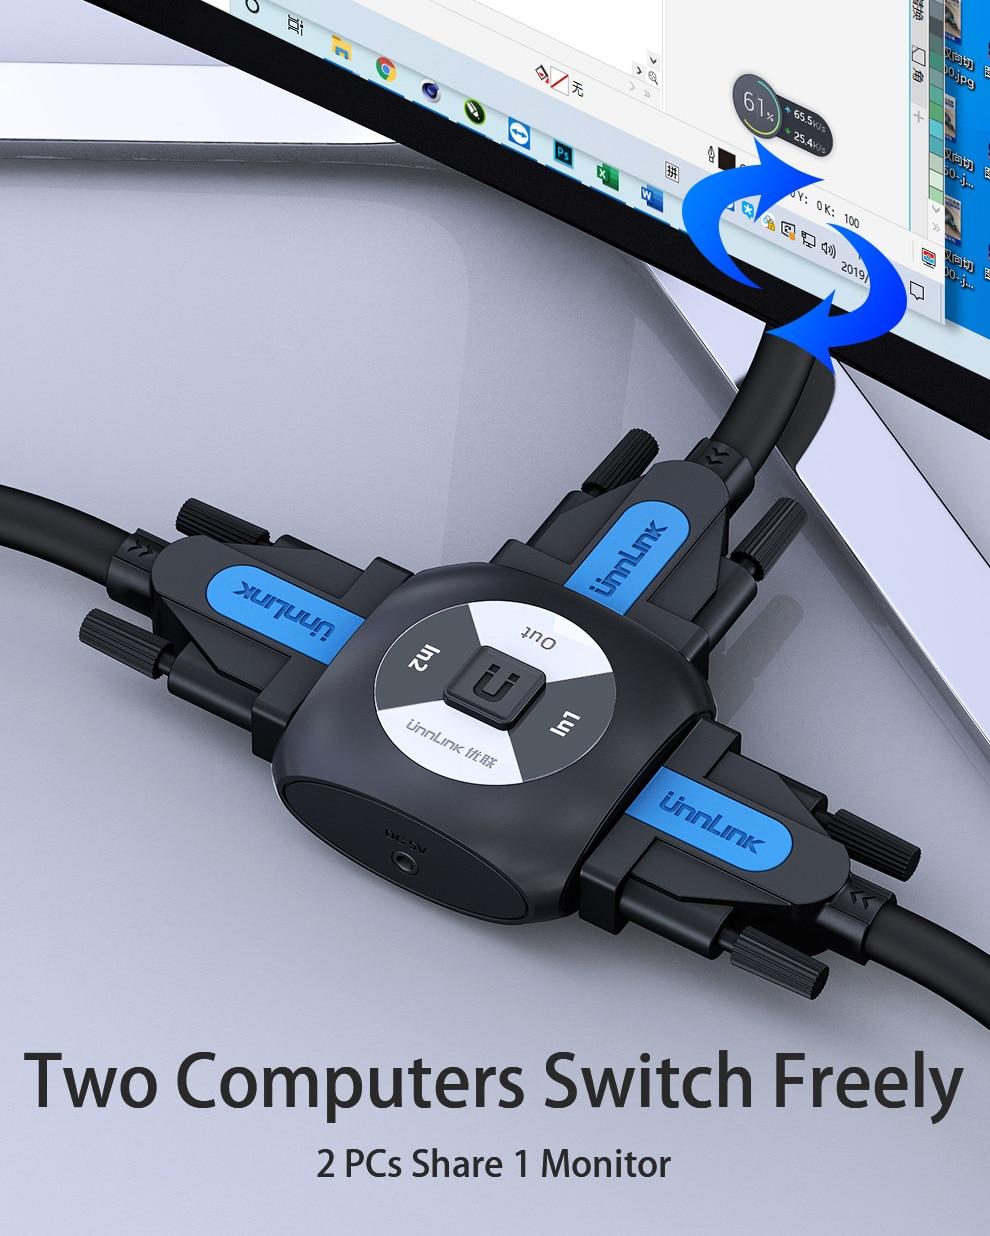 כרטיס גרפי החלף DVI Unnlink ספליטר דו כיווני Switch Switcher 2x1 / 1X2 UHD4K DVI AB עבור צג כרטיס גרפי שולחן מחשב (3)